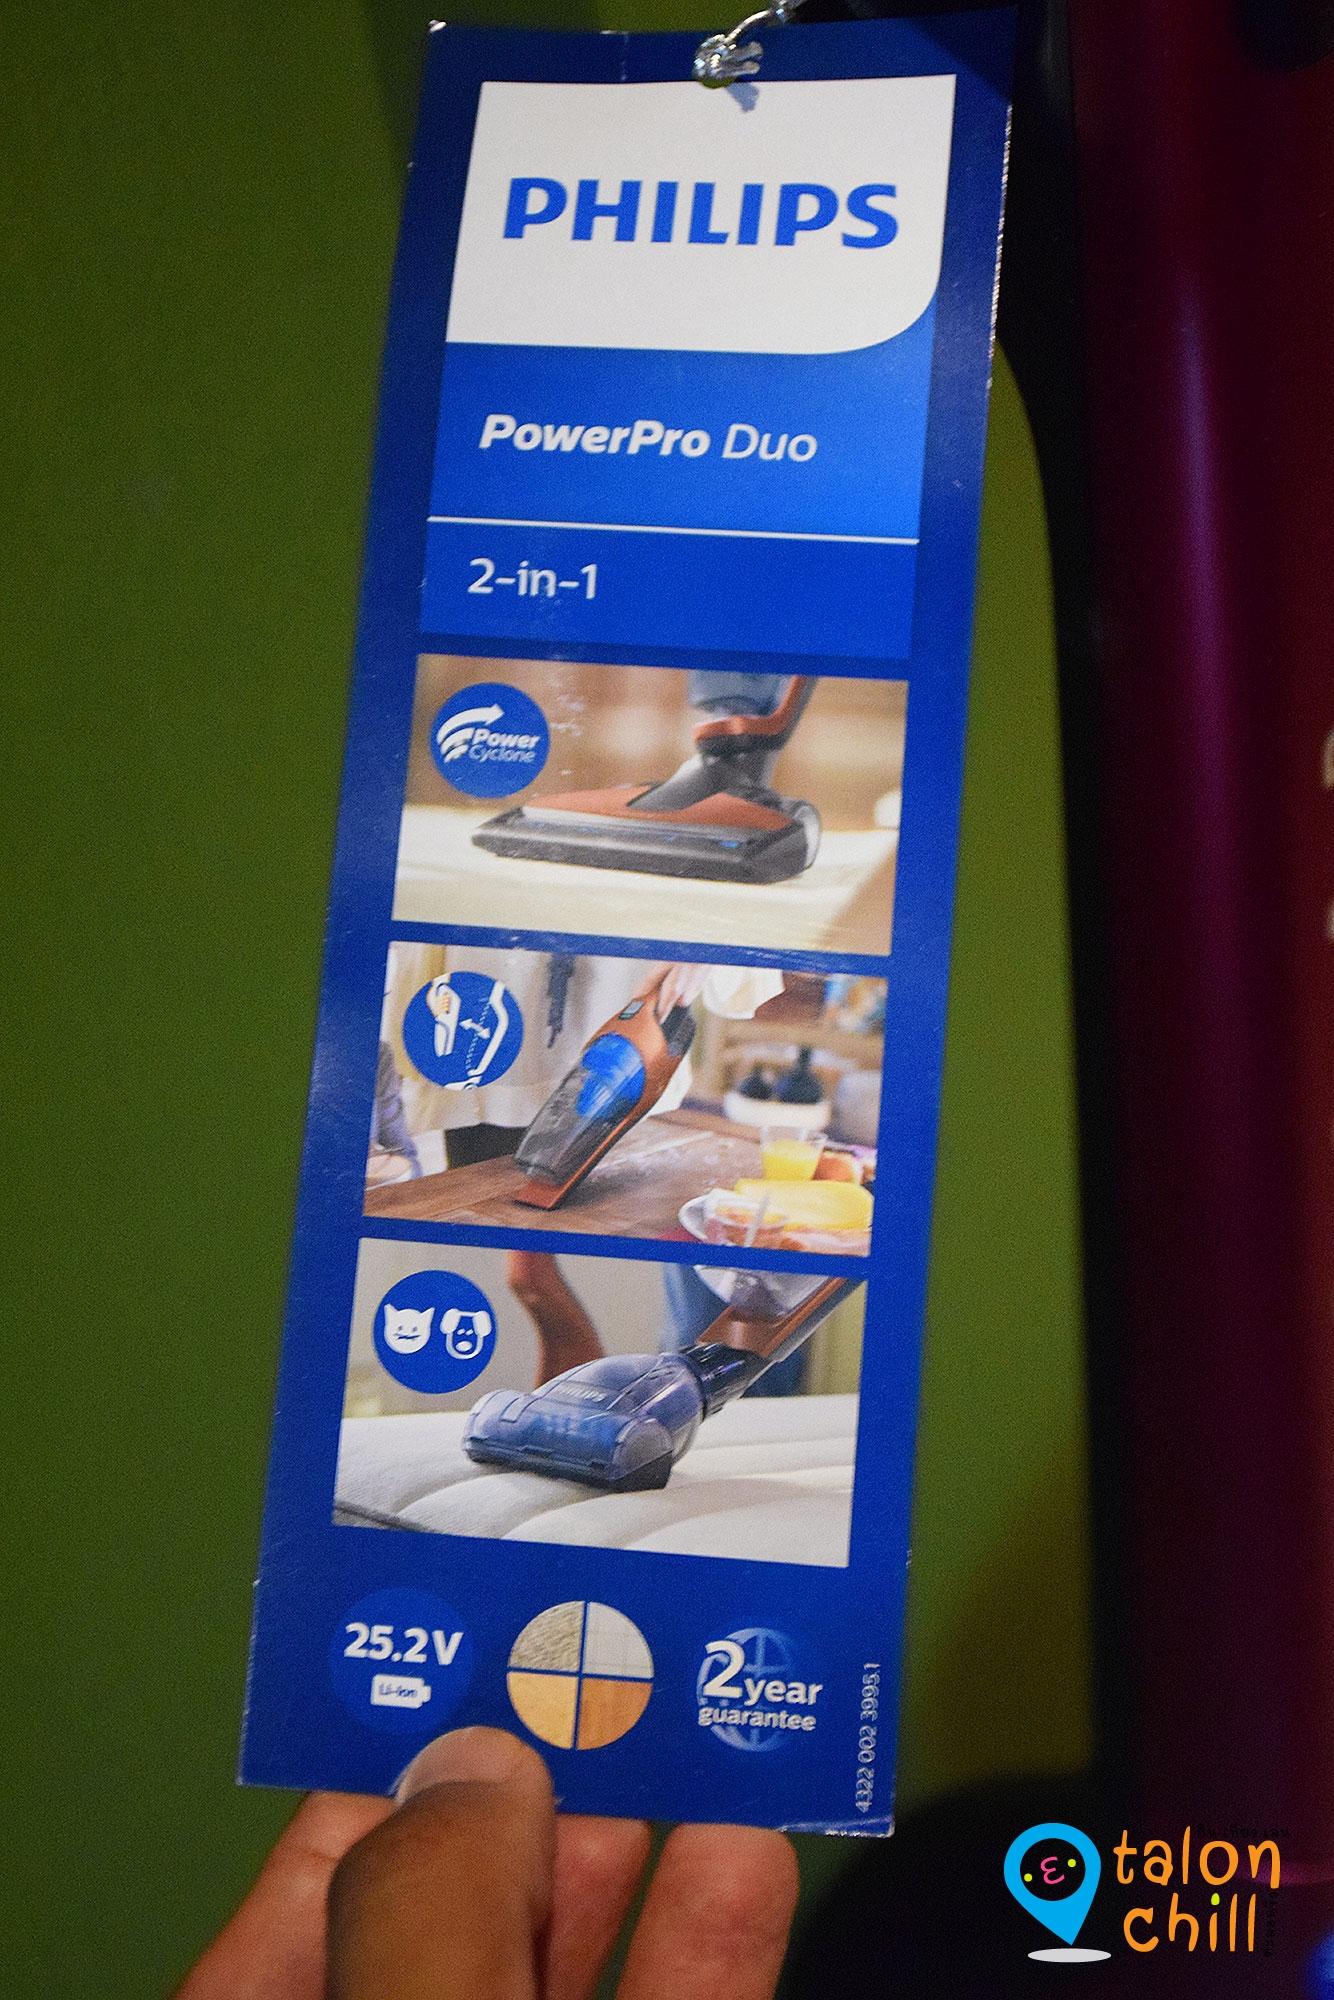 [Review] เครื่องดูดฝุ่นไร้สาย 2 in 1 (Philips PowerPro Duo) ช่วยทำความสะอาดได้อย่างหมดจด #sponsoredreview